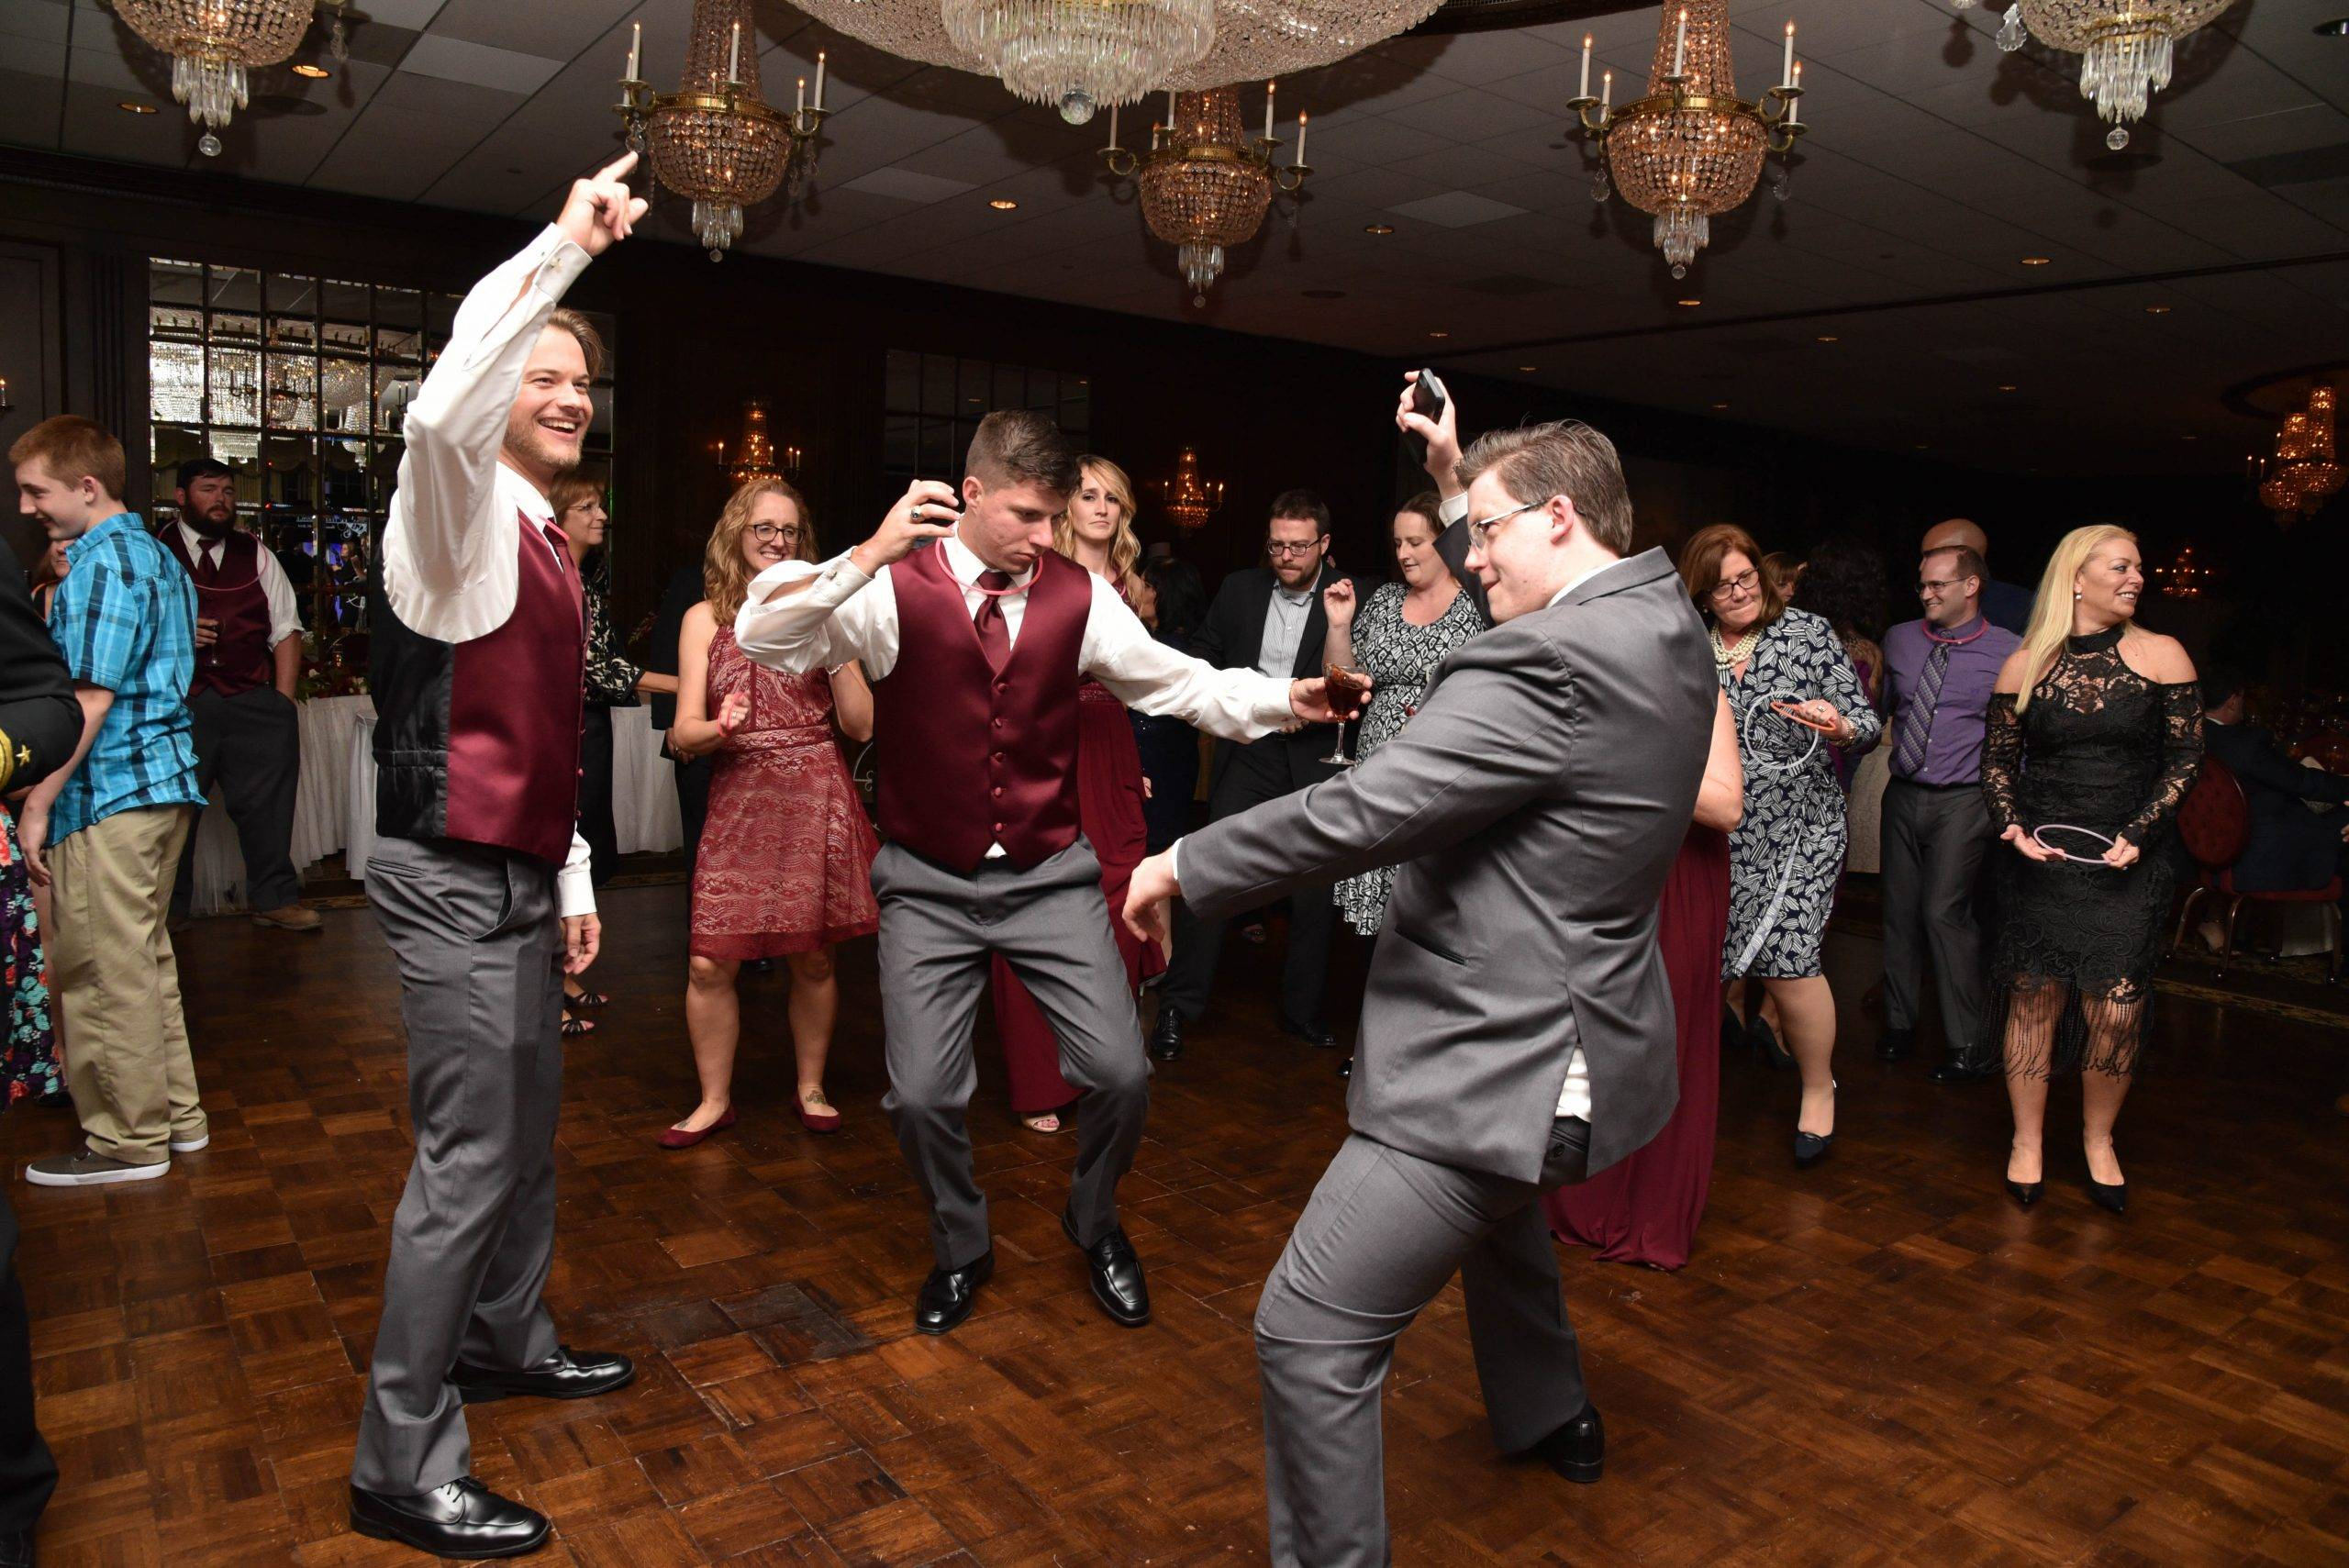 Birchwood Manor dancing